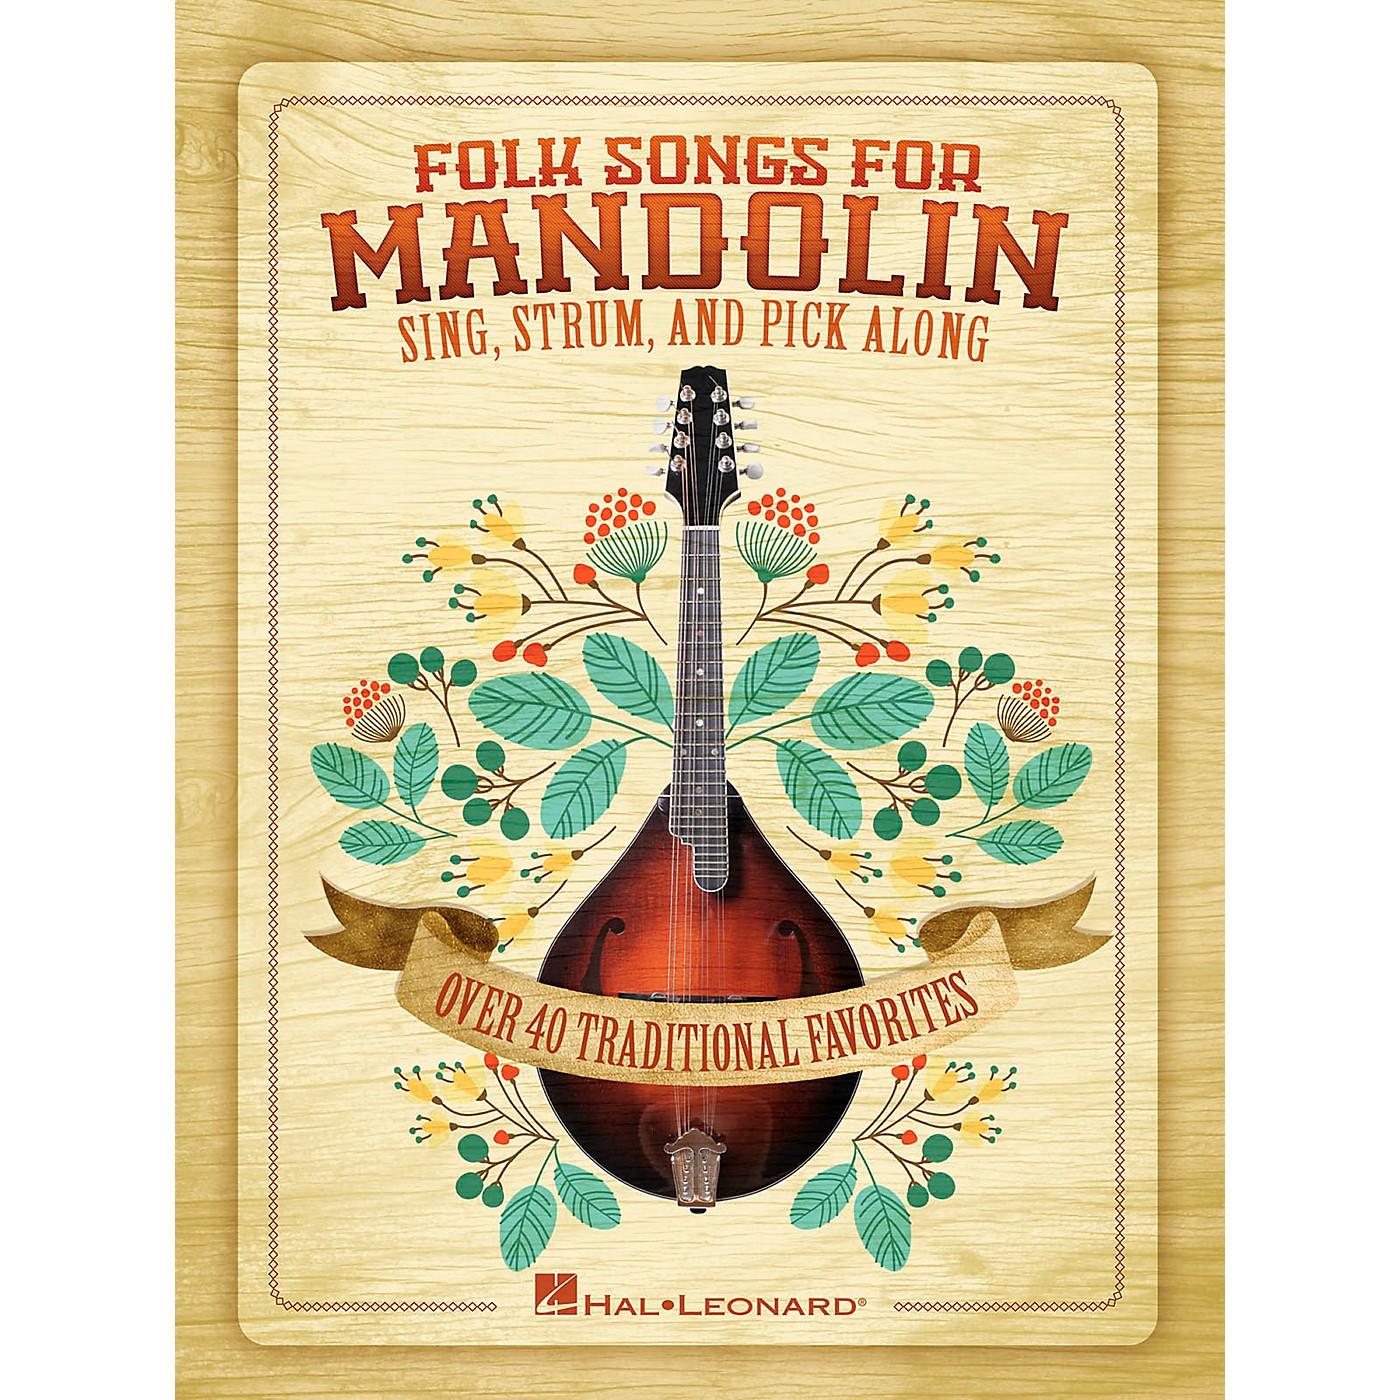 Hal Leonard Folk Songs For Mandolin - Sing, Strum and Pick Along thumbnail